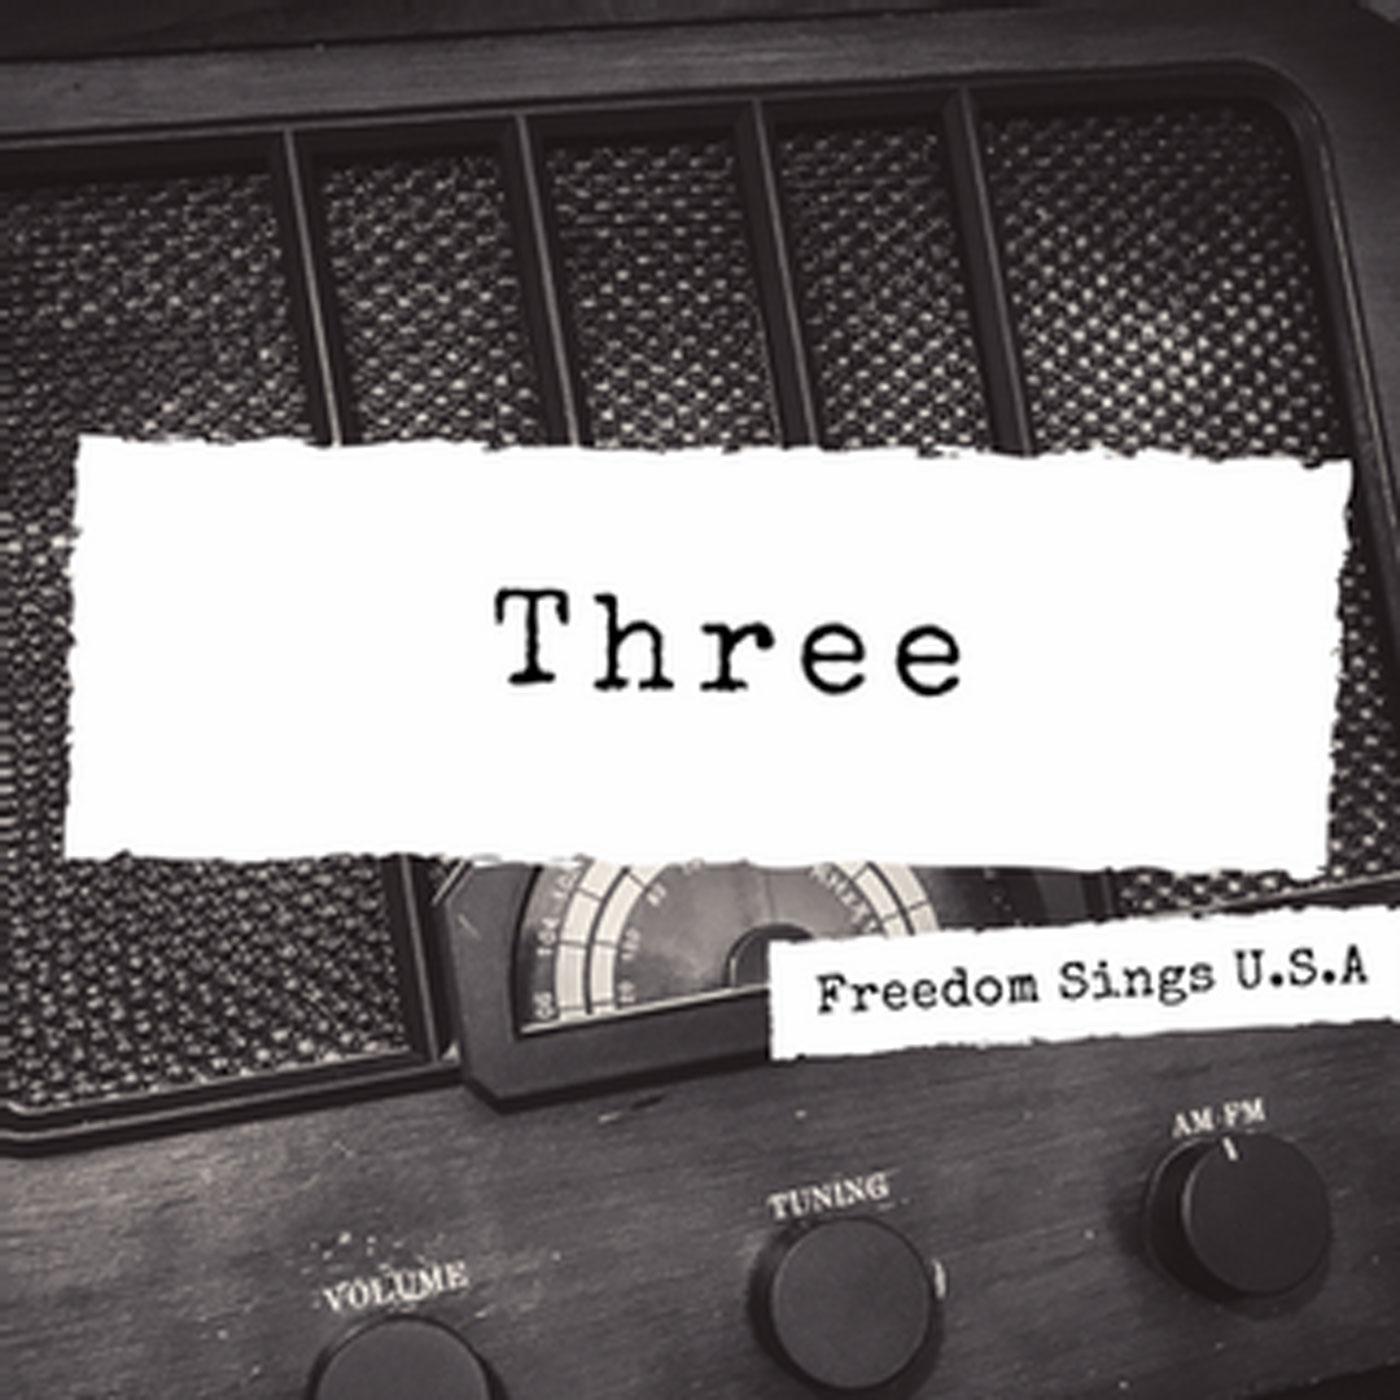 Freedom Sings USA Volume III